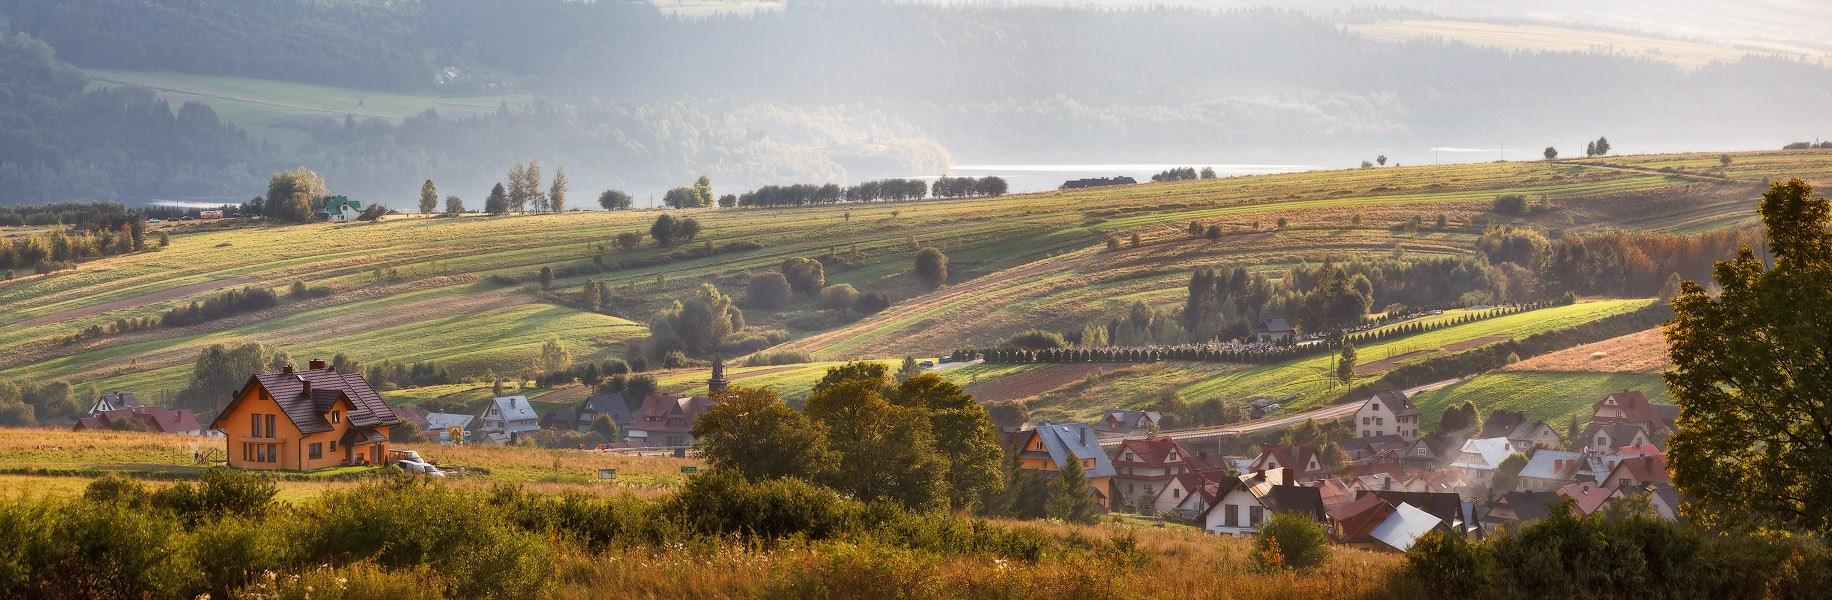 Фото пейзажи чехословакия 3